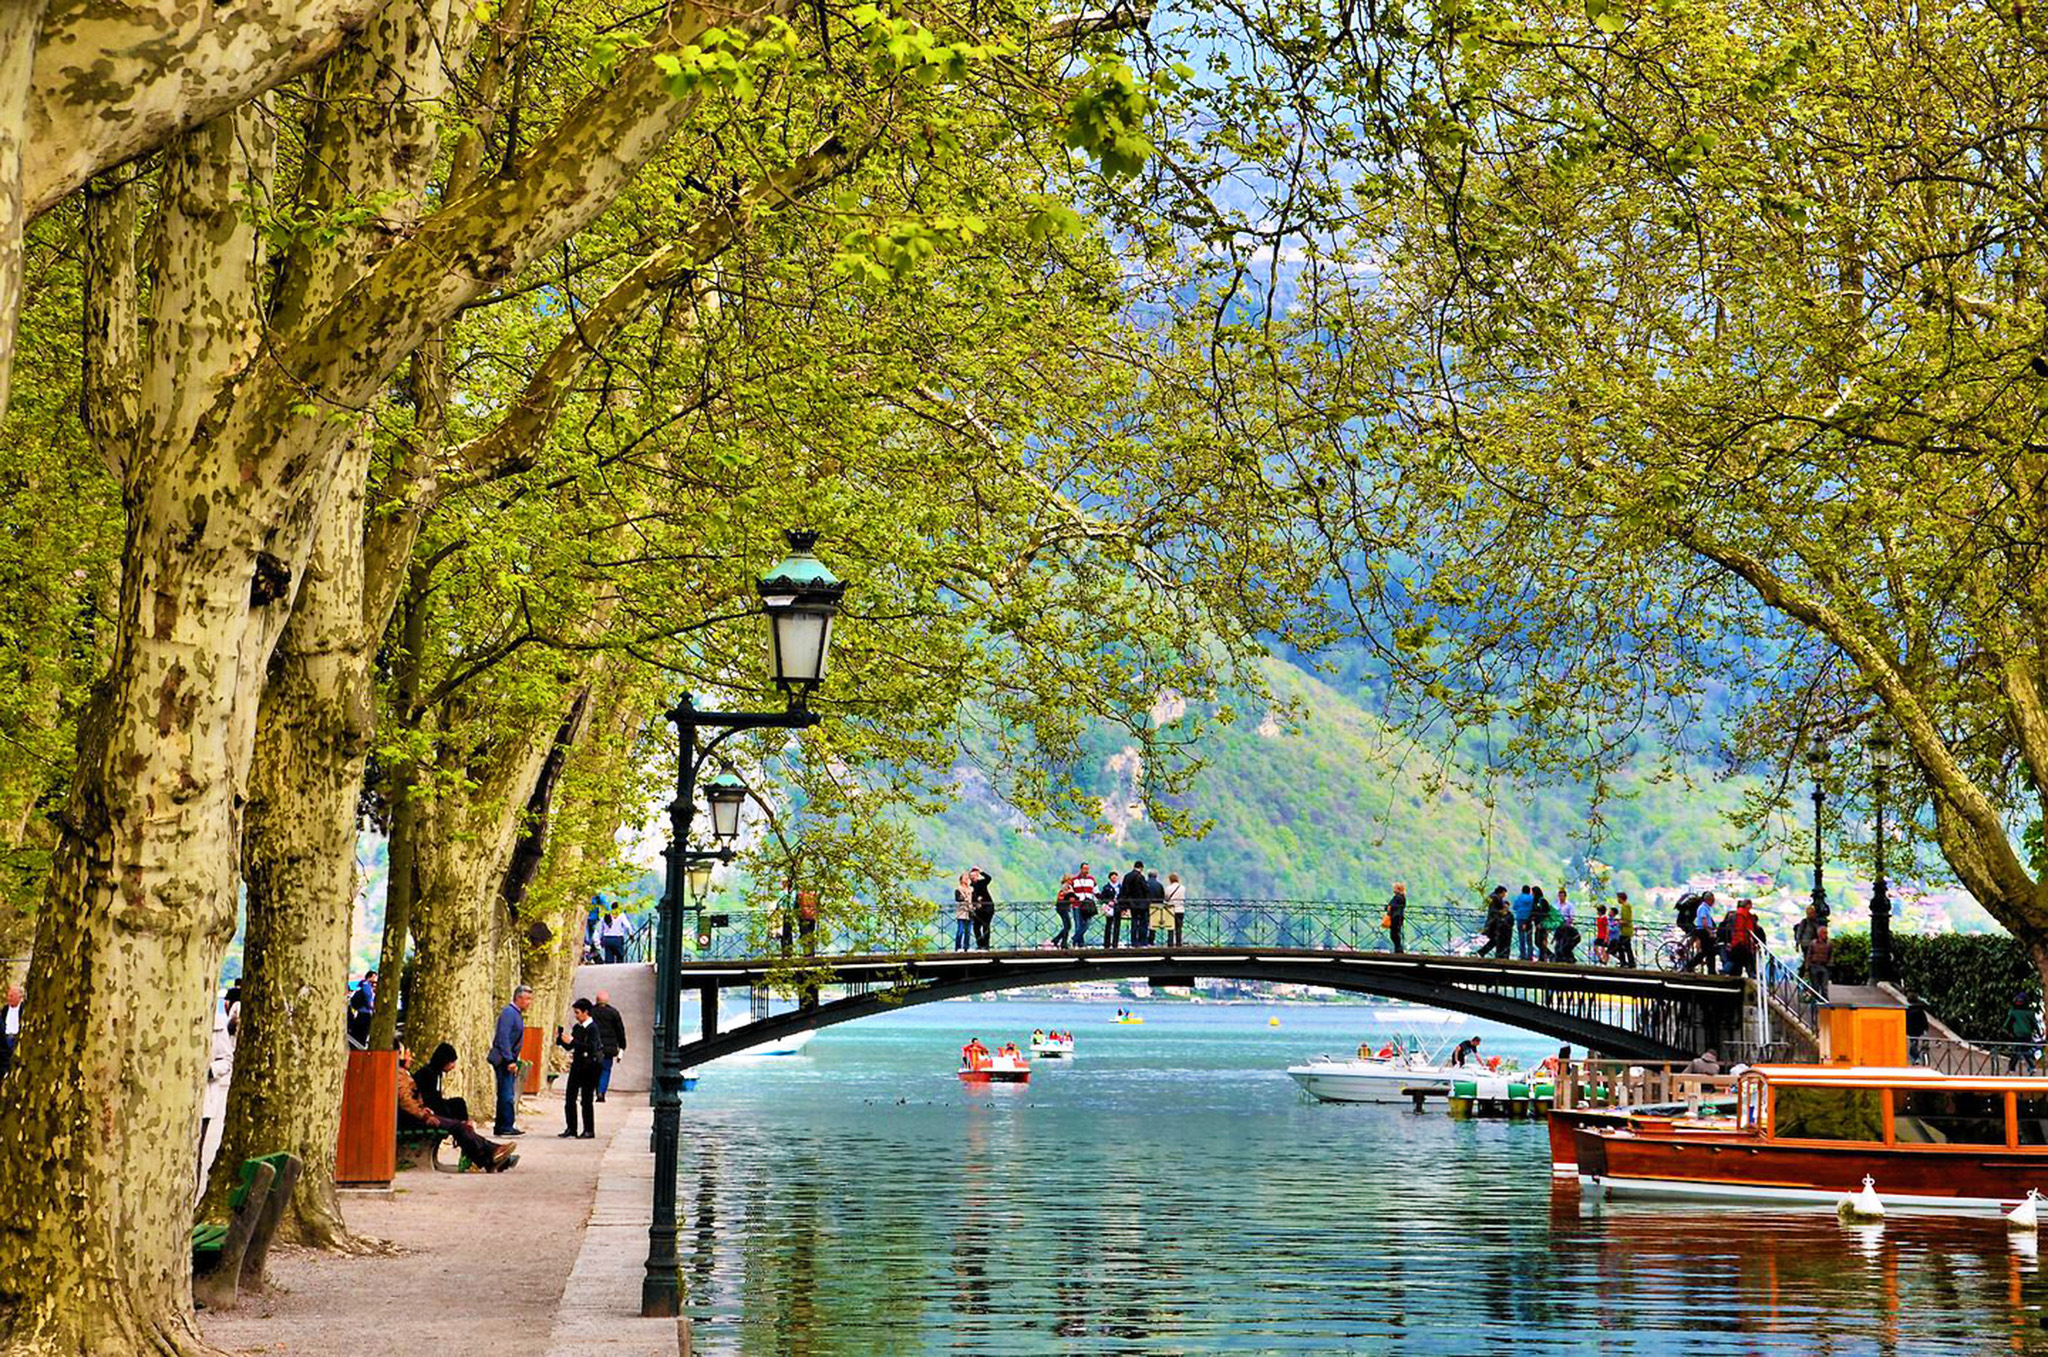 kt_2020_370_Keytours_excursions_Swisstours_annecy_pont_des_amours3_2048_10